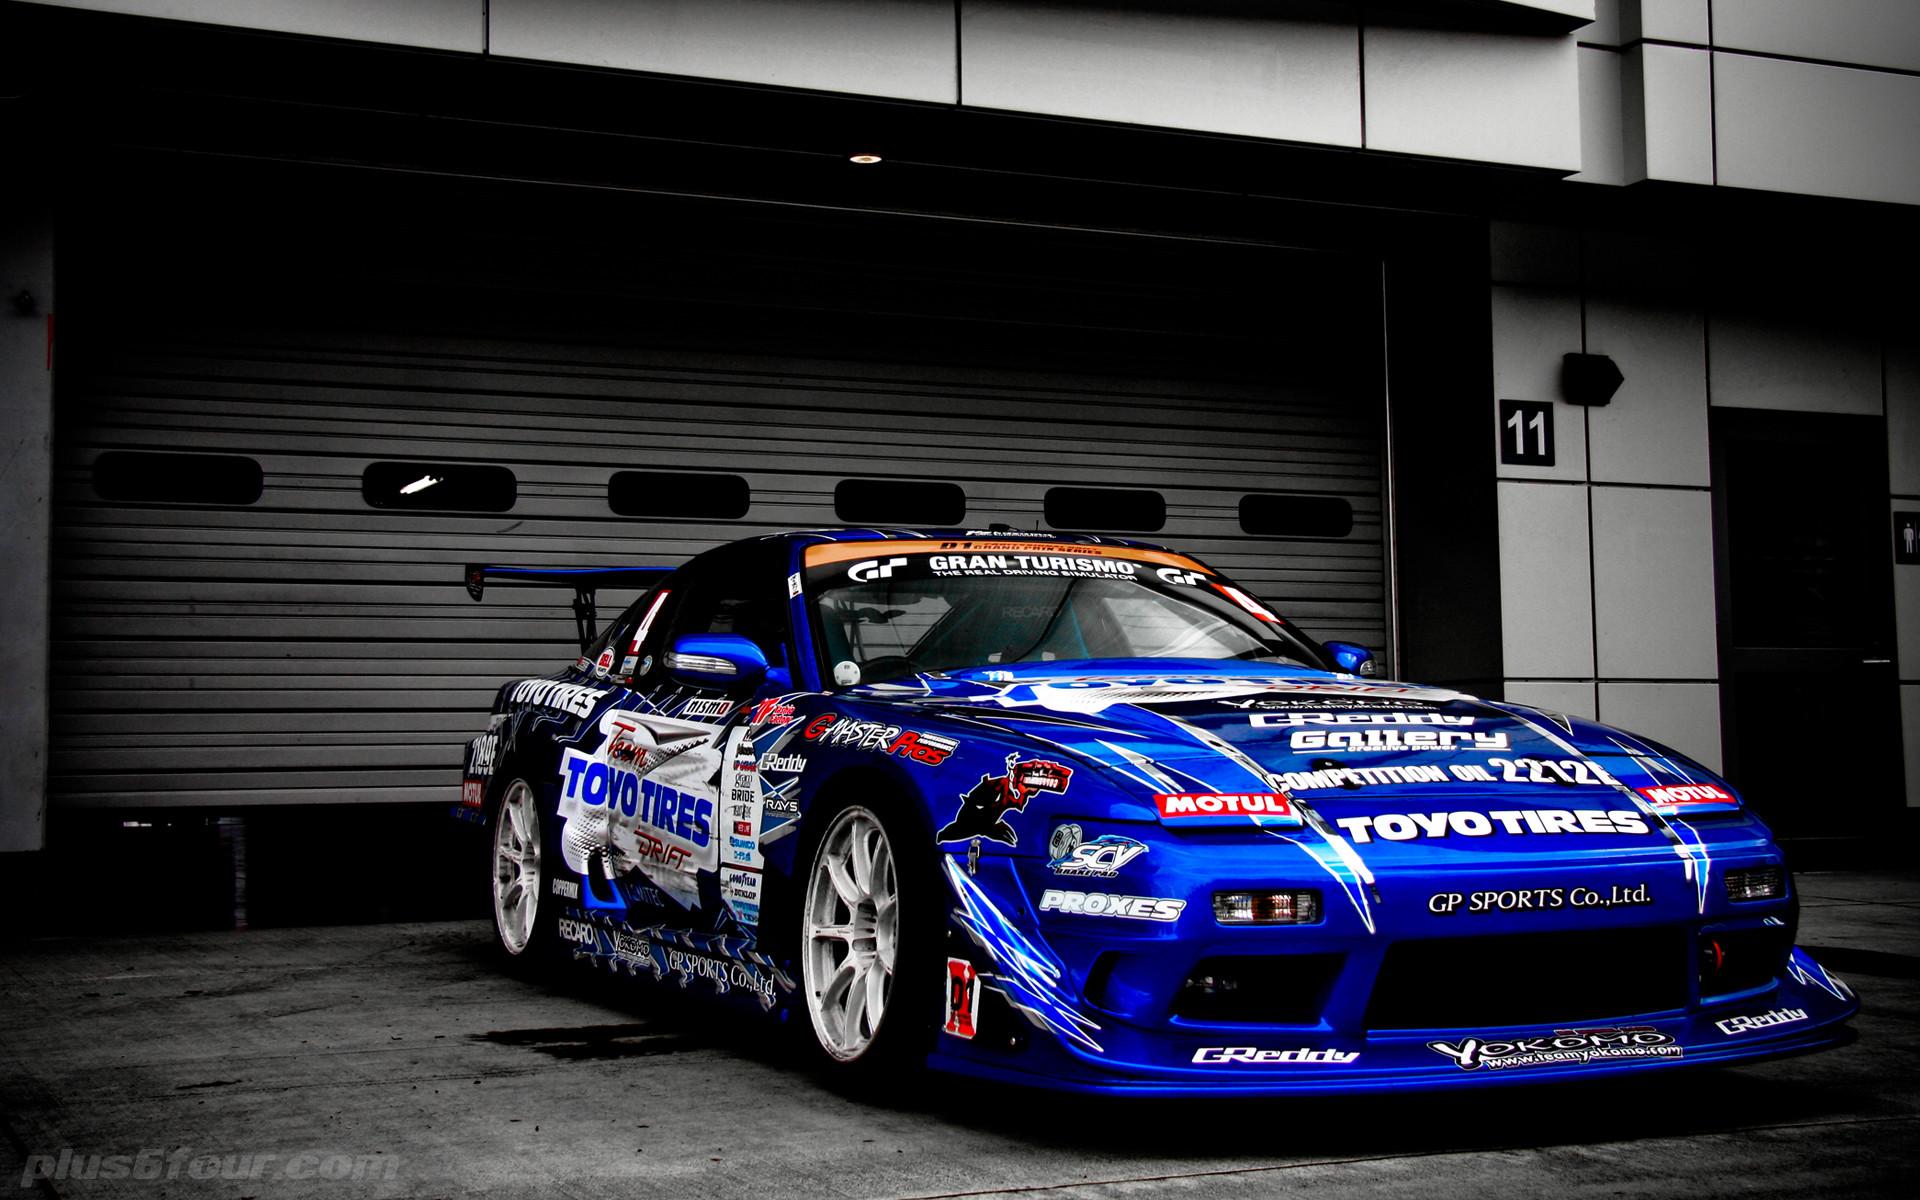 drift cars wallpaper (71+ images)